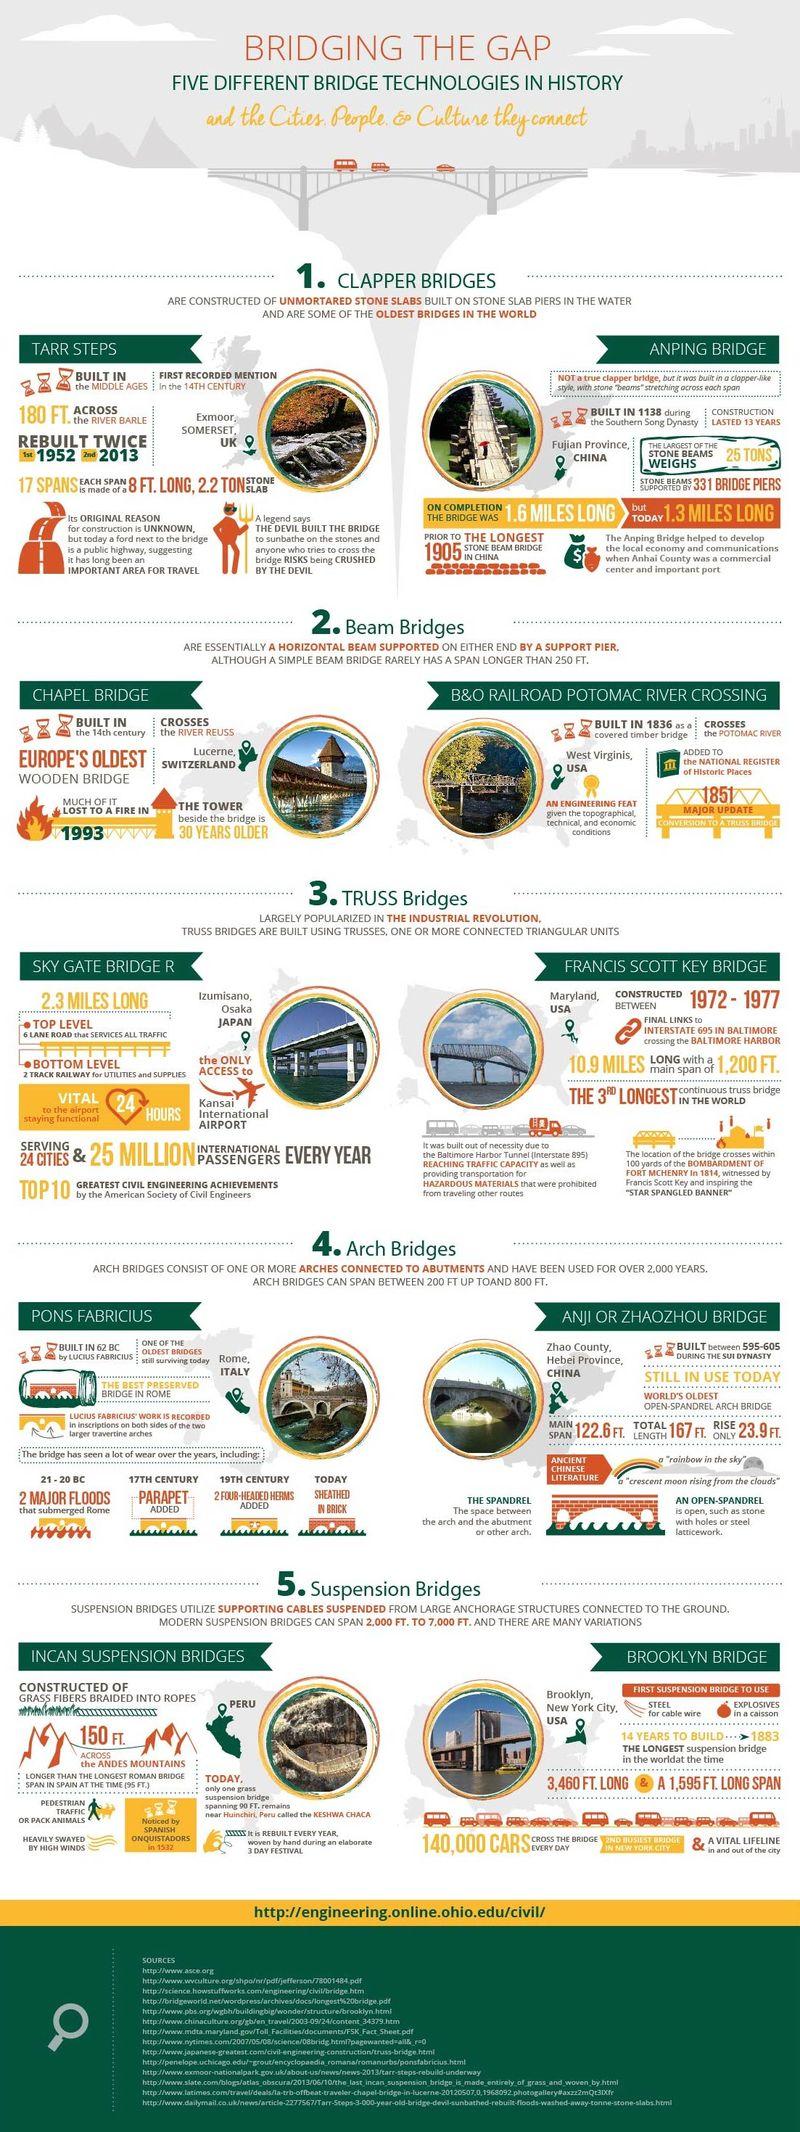 Bridging_the_Gap_Infographic